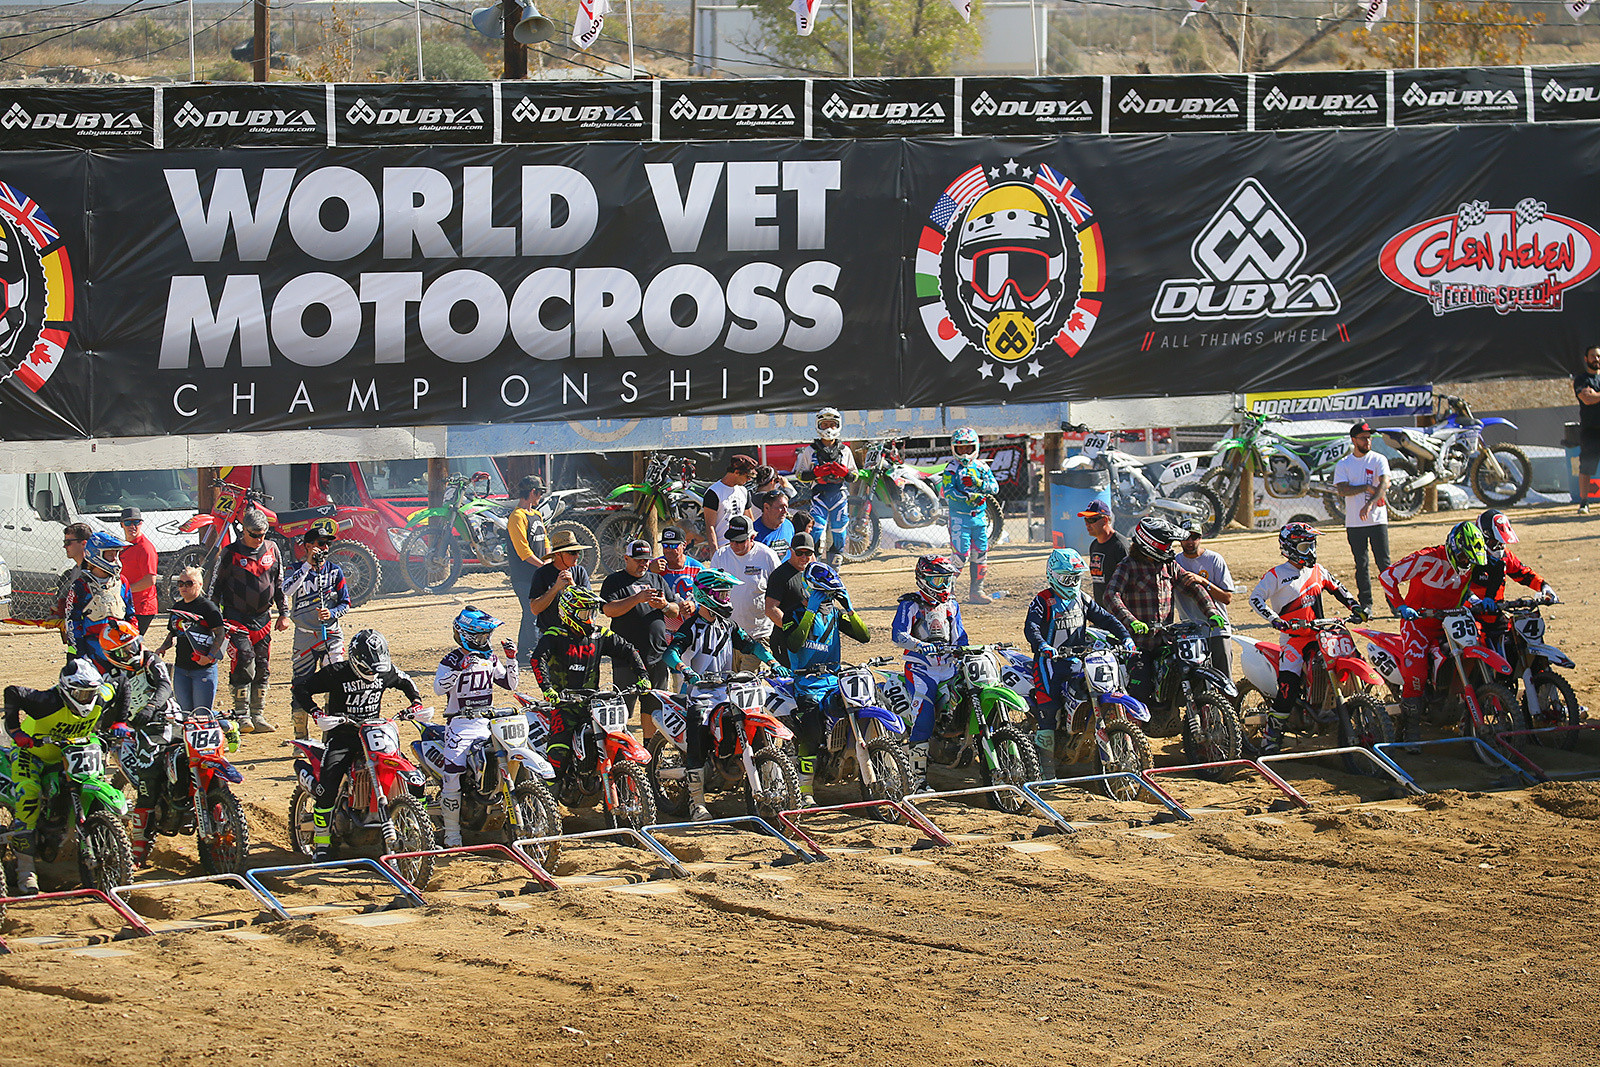 2016 Dubya World Vet Motocross Championships - Photo Gallery: Dubya World Vet Championships - Motocross Pictures - Vital MX